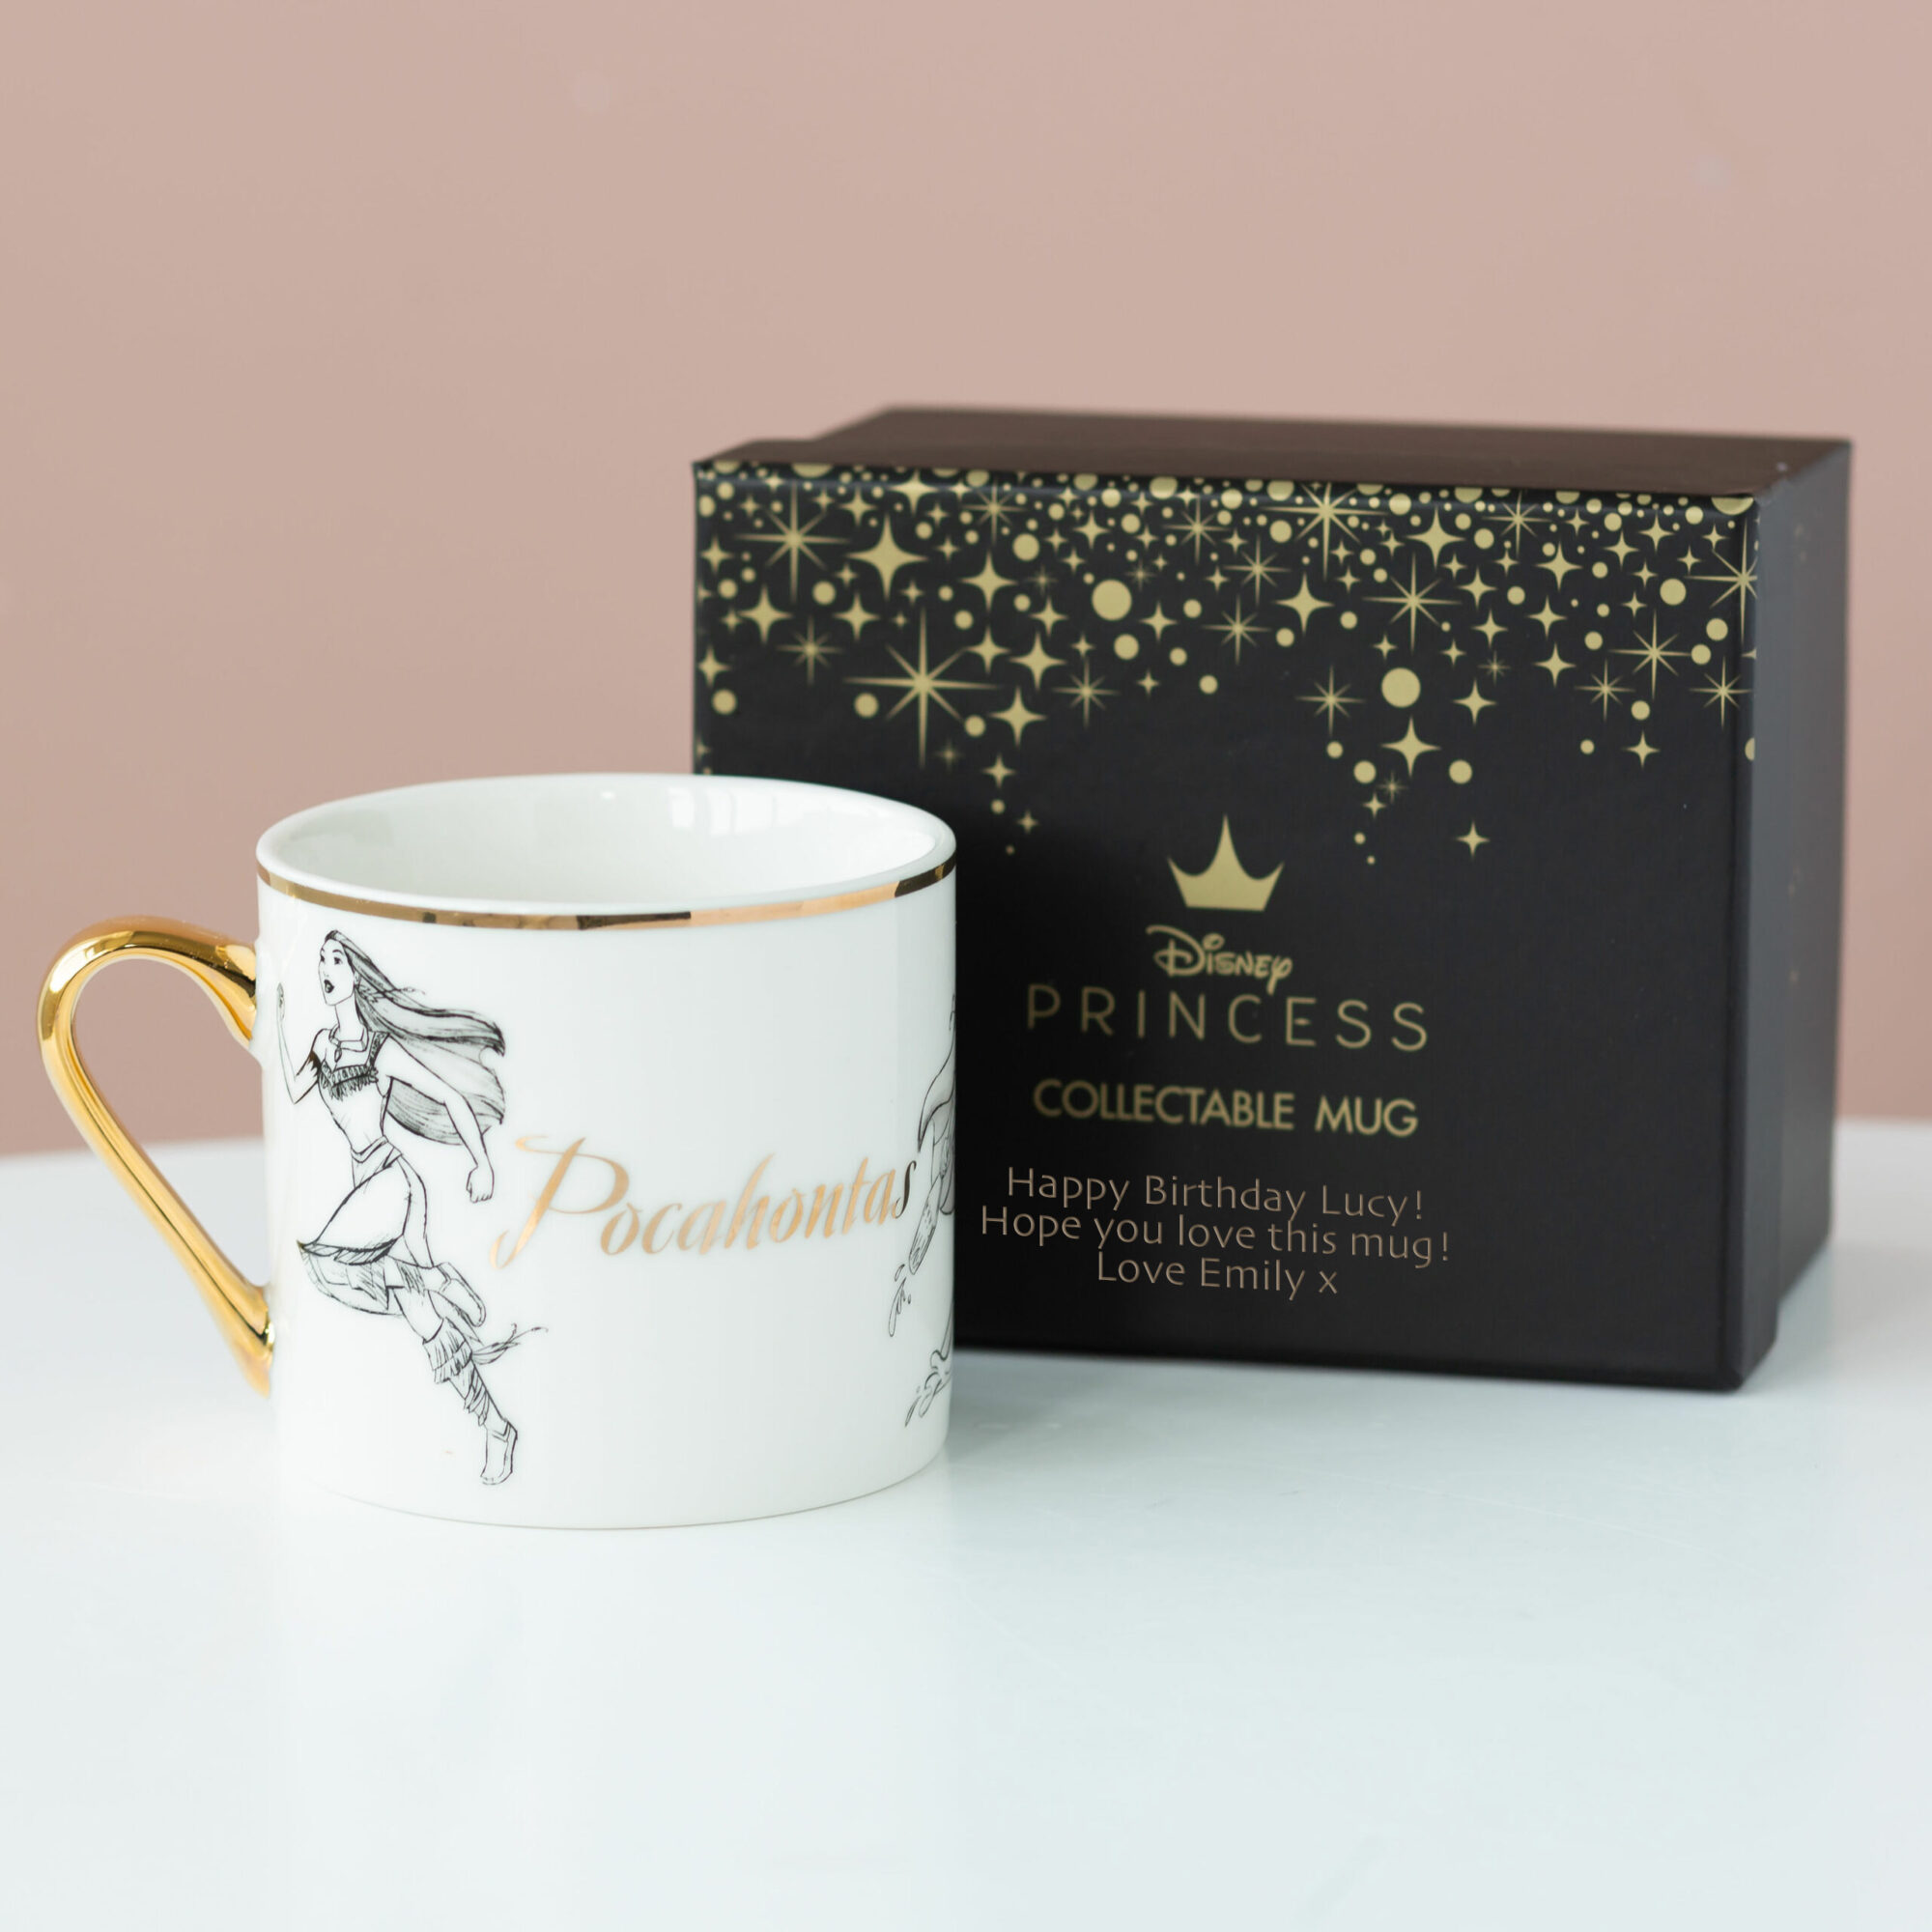 Pocahontas Disney Limited Edition Mug with Personalised Gift Box